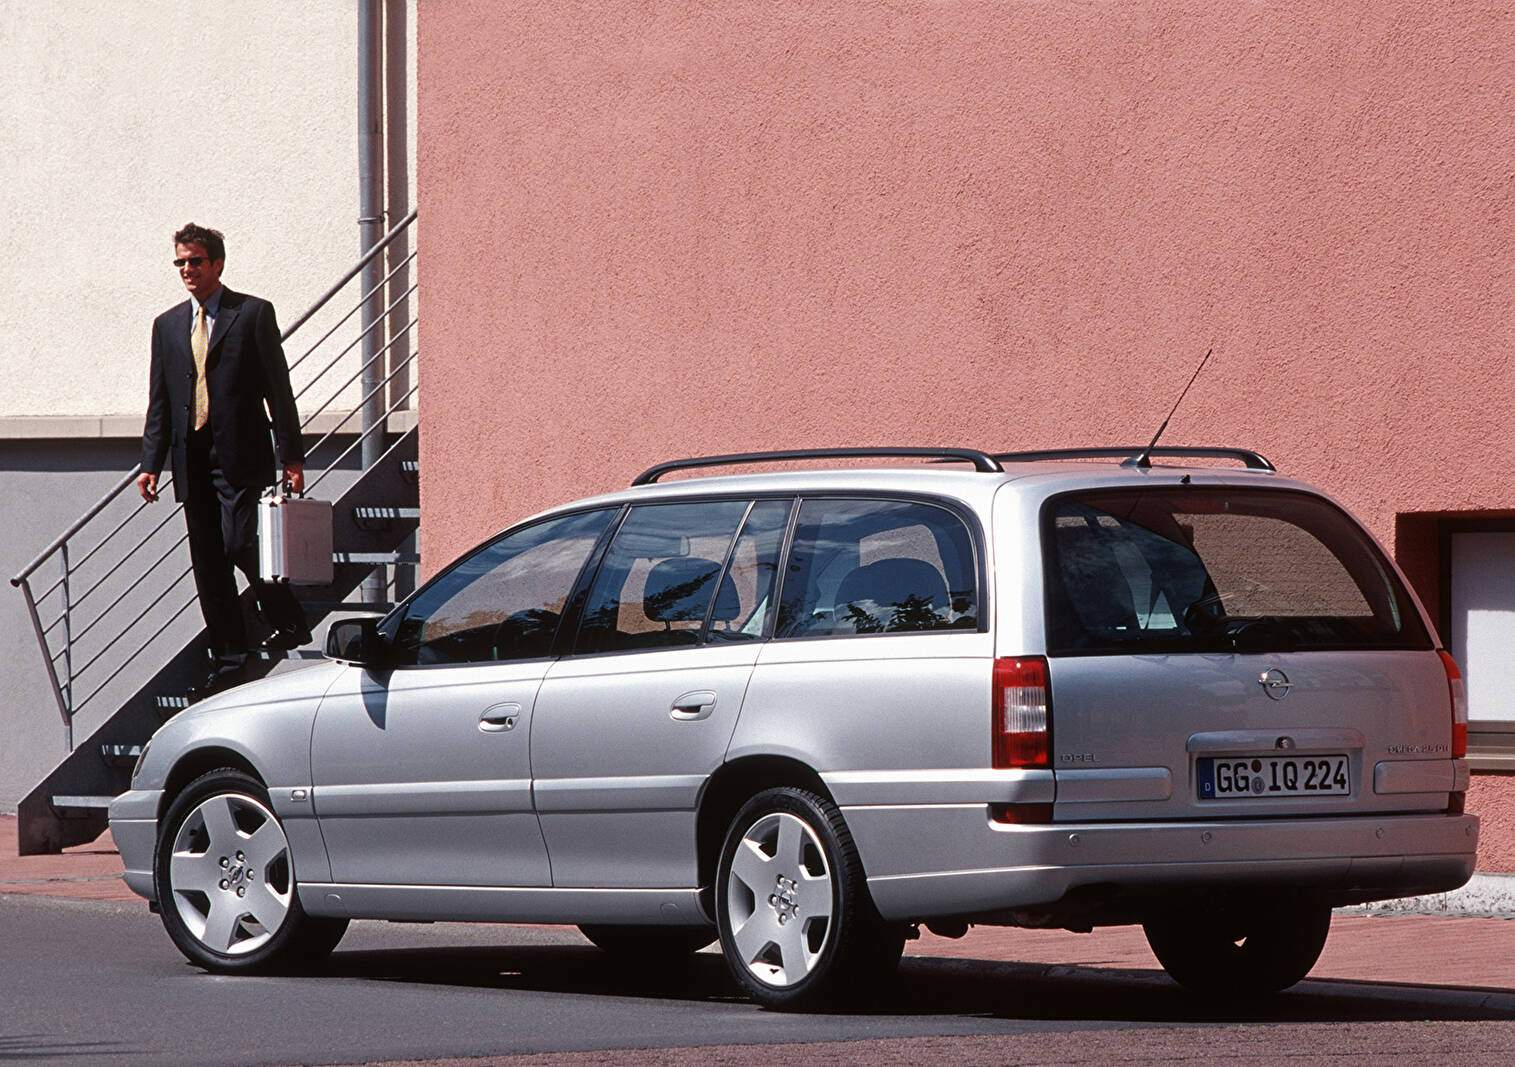 Opel Omega II Caravan 2.5 DTI 150 (B) (2001-2003),  ajouté par fox58